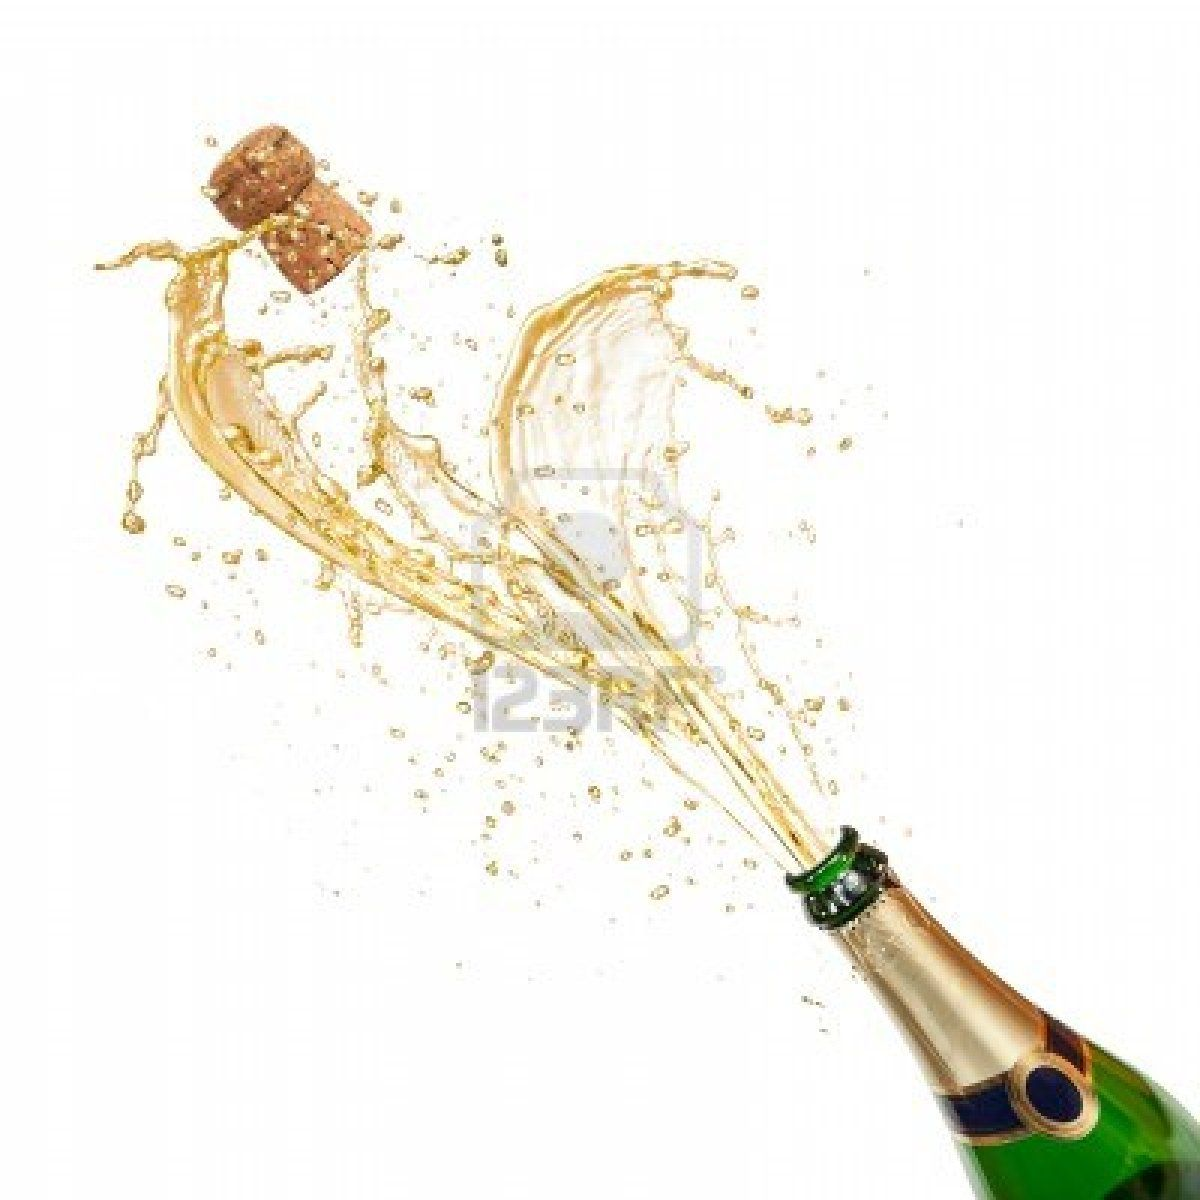 Champagne Wine Splash Isolated On White Background Wine Photography Pop Champagne Splash Photography